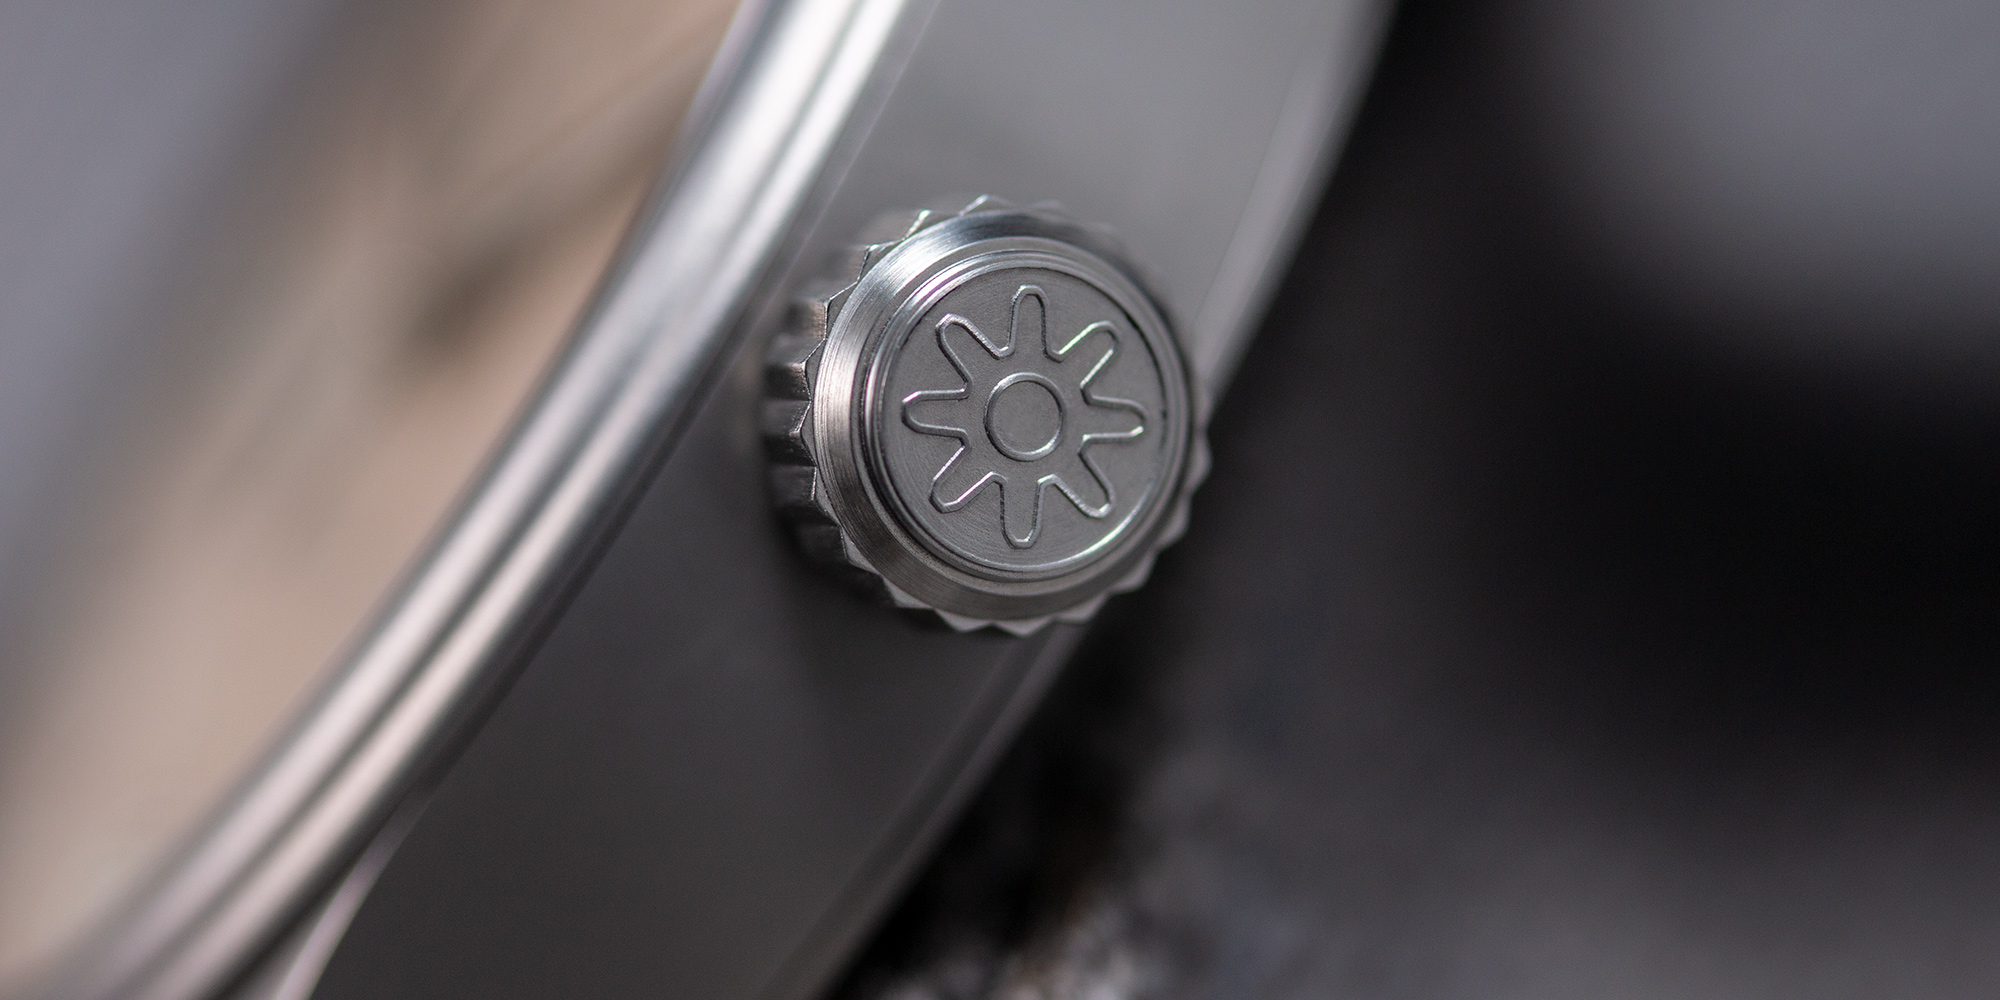 Pinion-Atom-39-no-date-watch-pale-slate-012